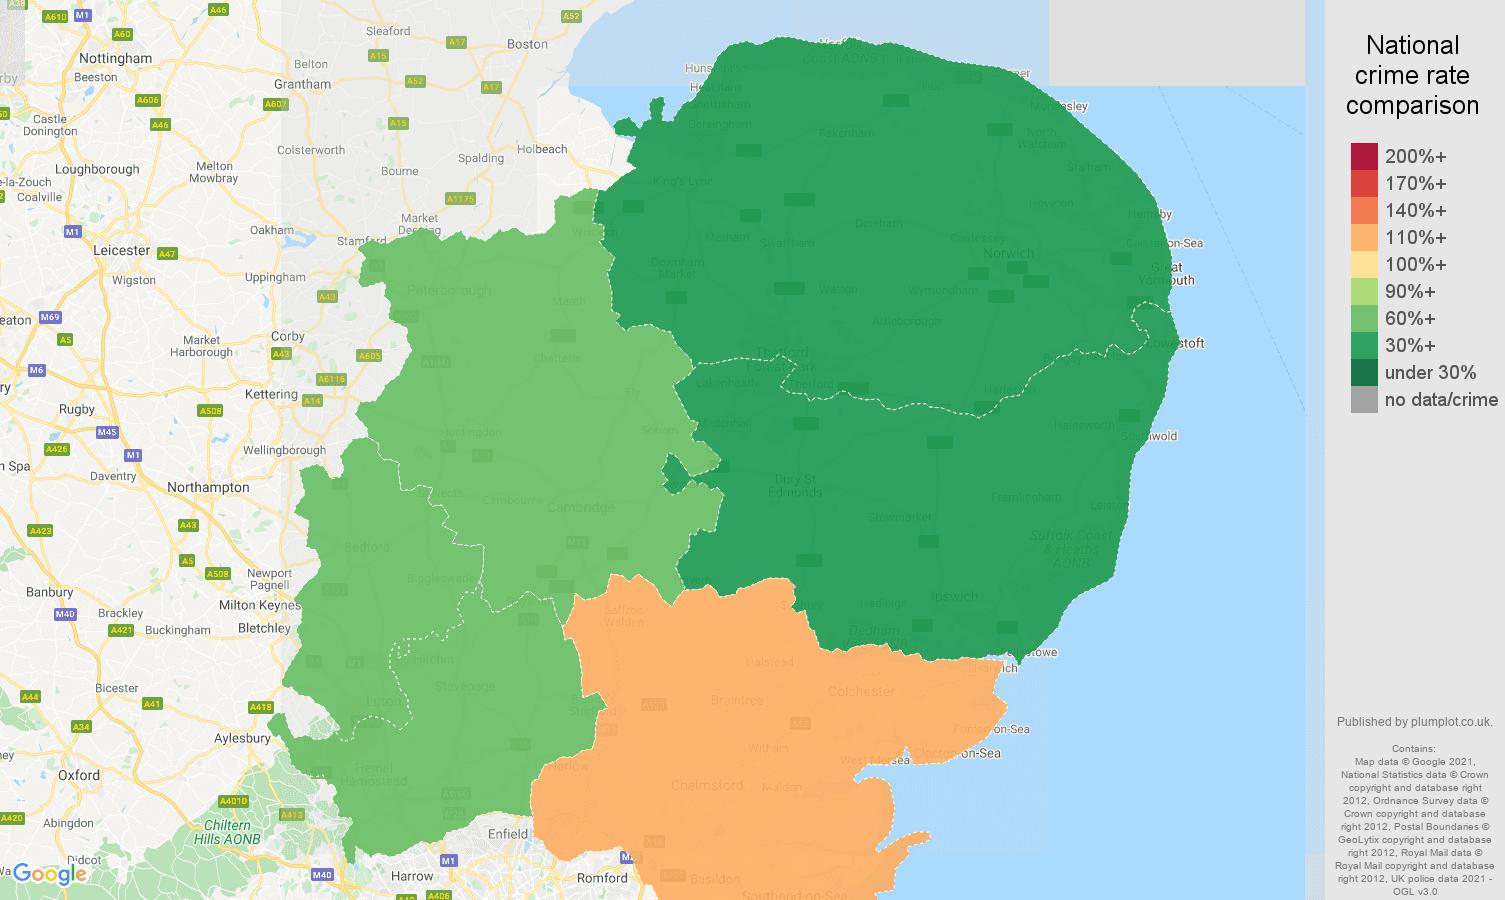 East of England antisocial behaviour crime rate comparison map